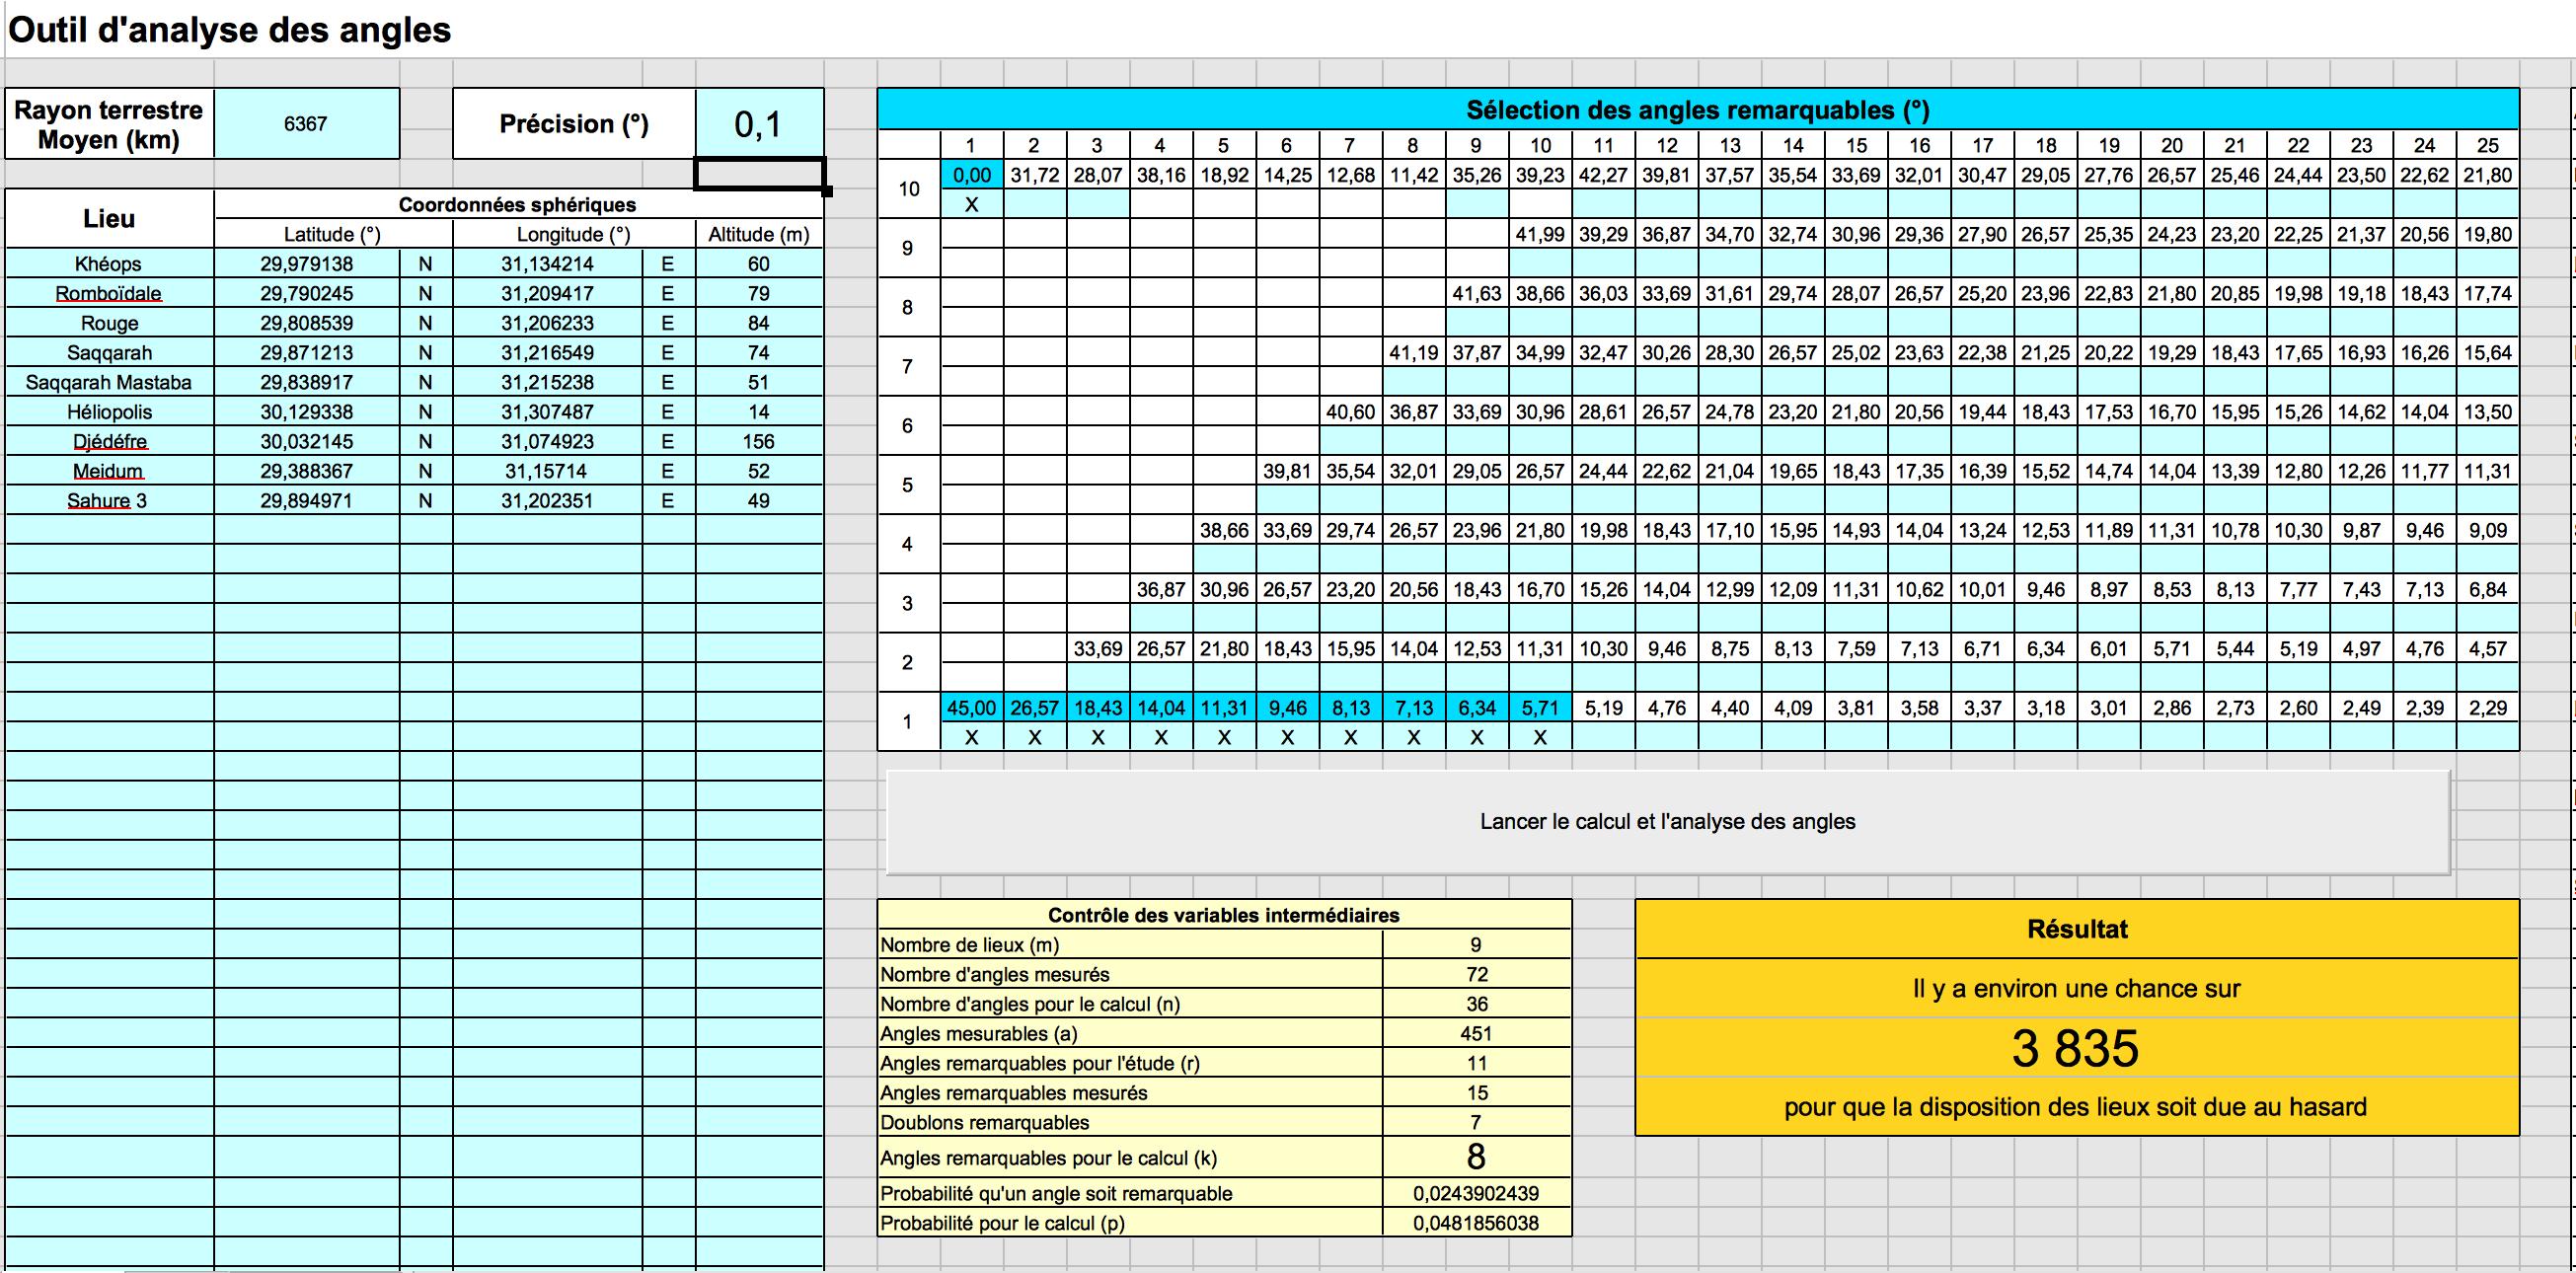 2017-11-16 10:42:56